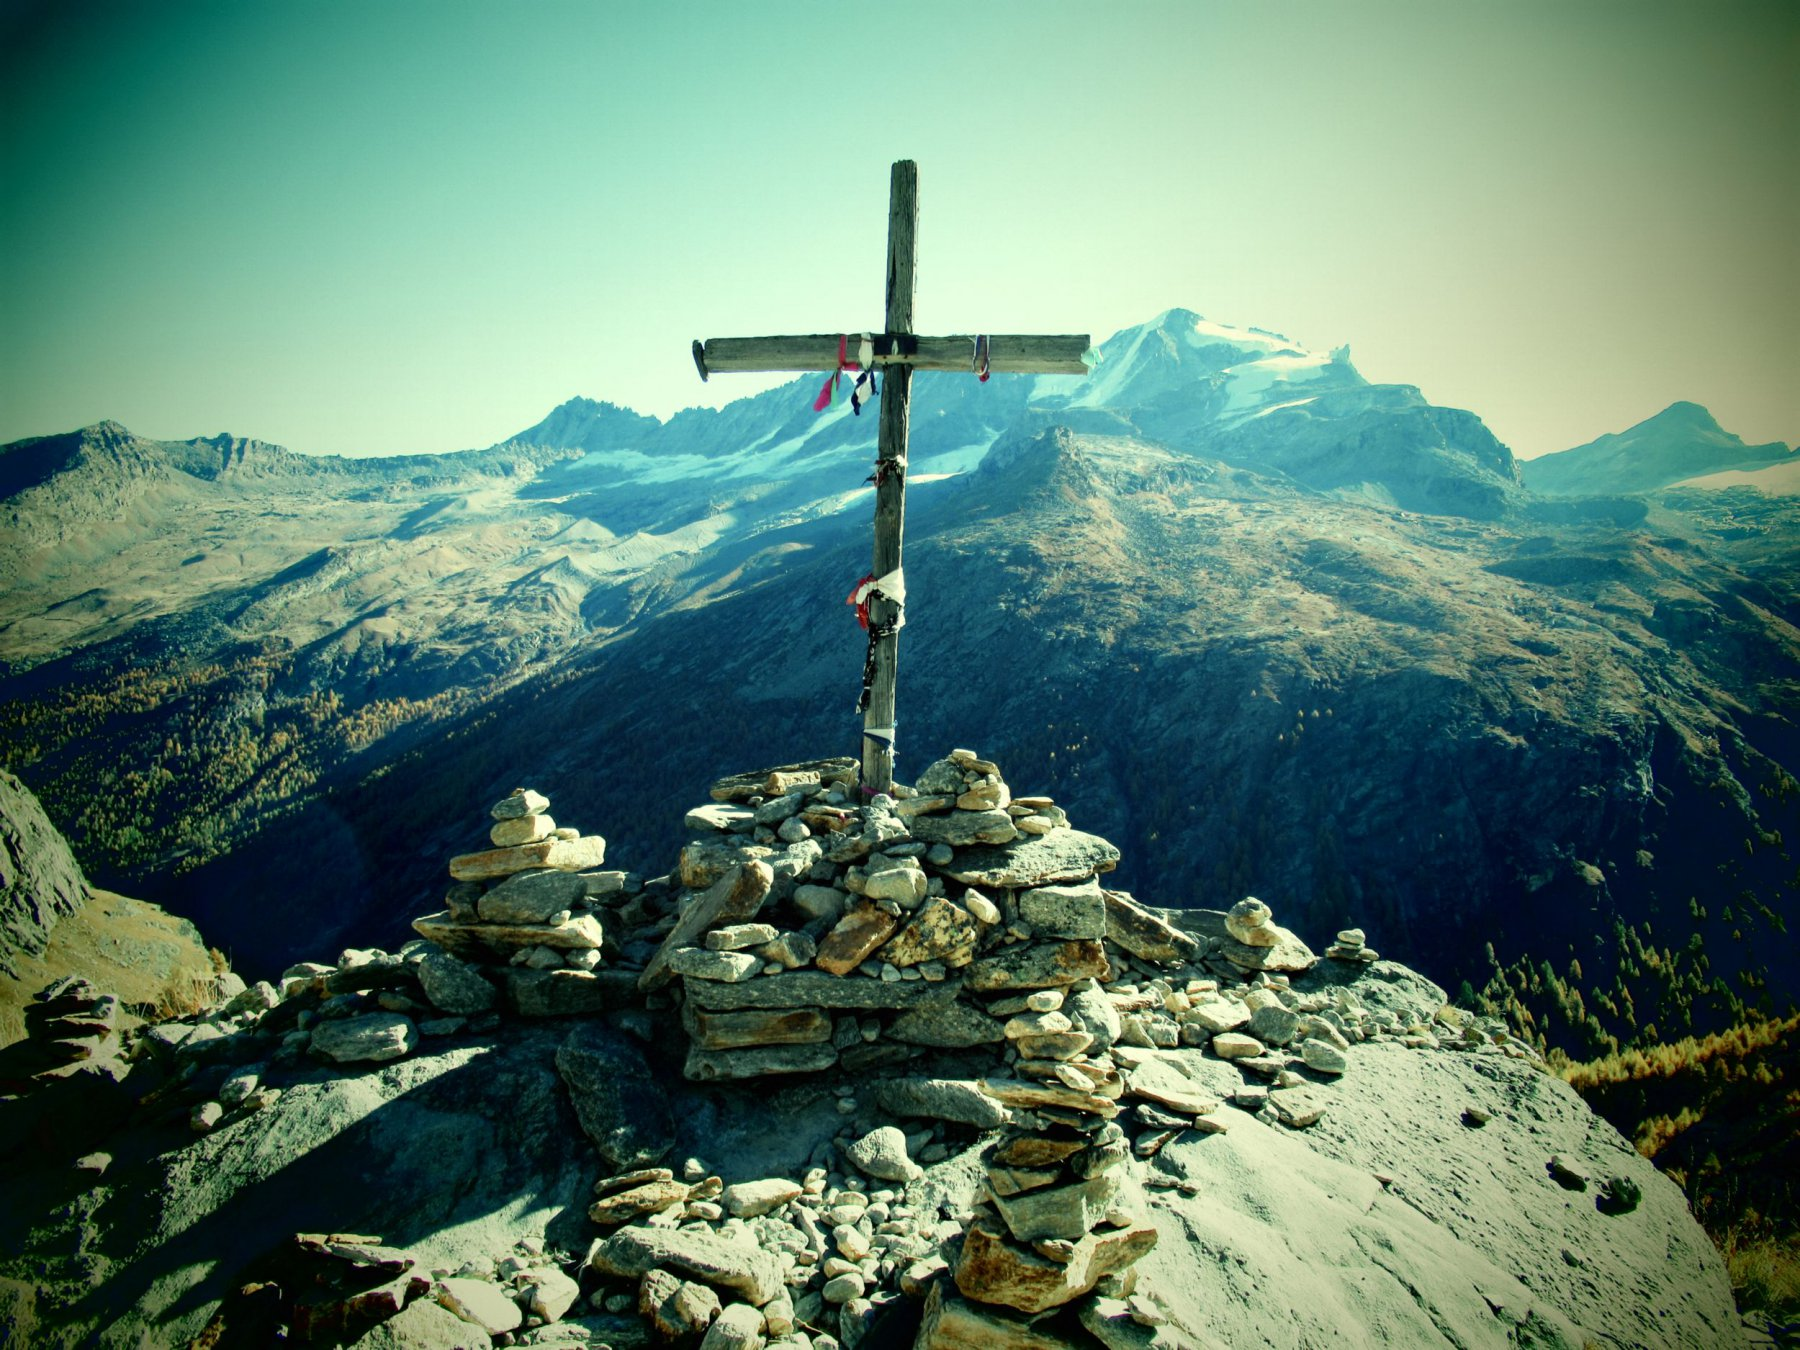 Croce dell'Arolley